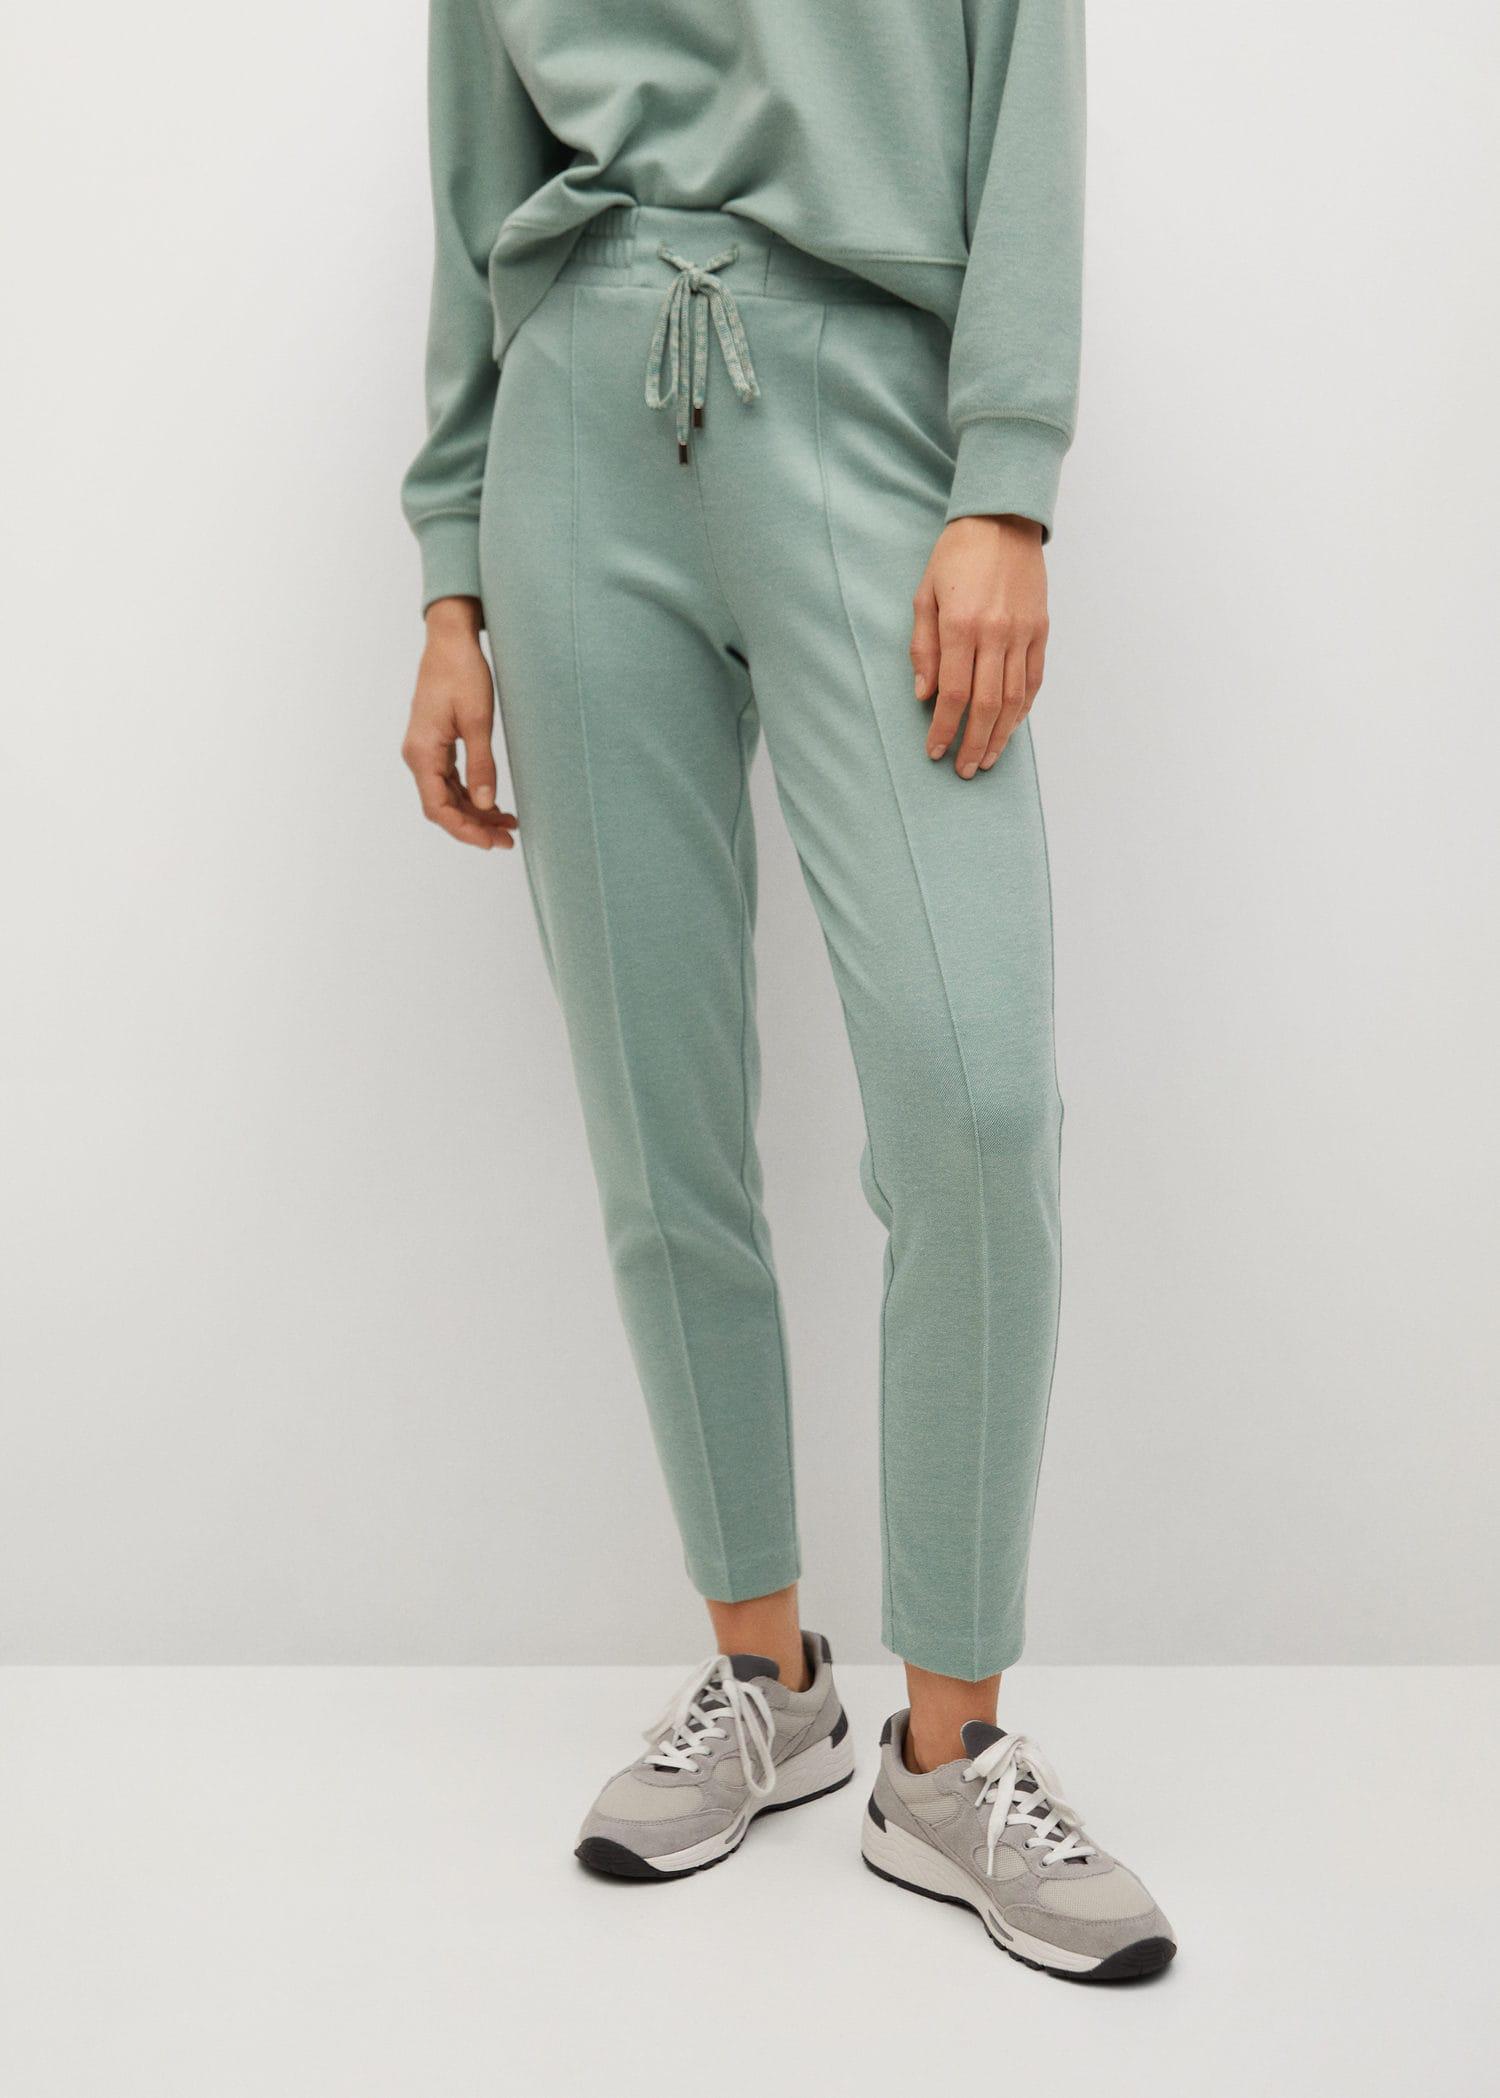 Pantalones De Mujer 2021 Mango Espana